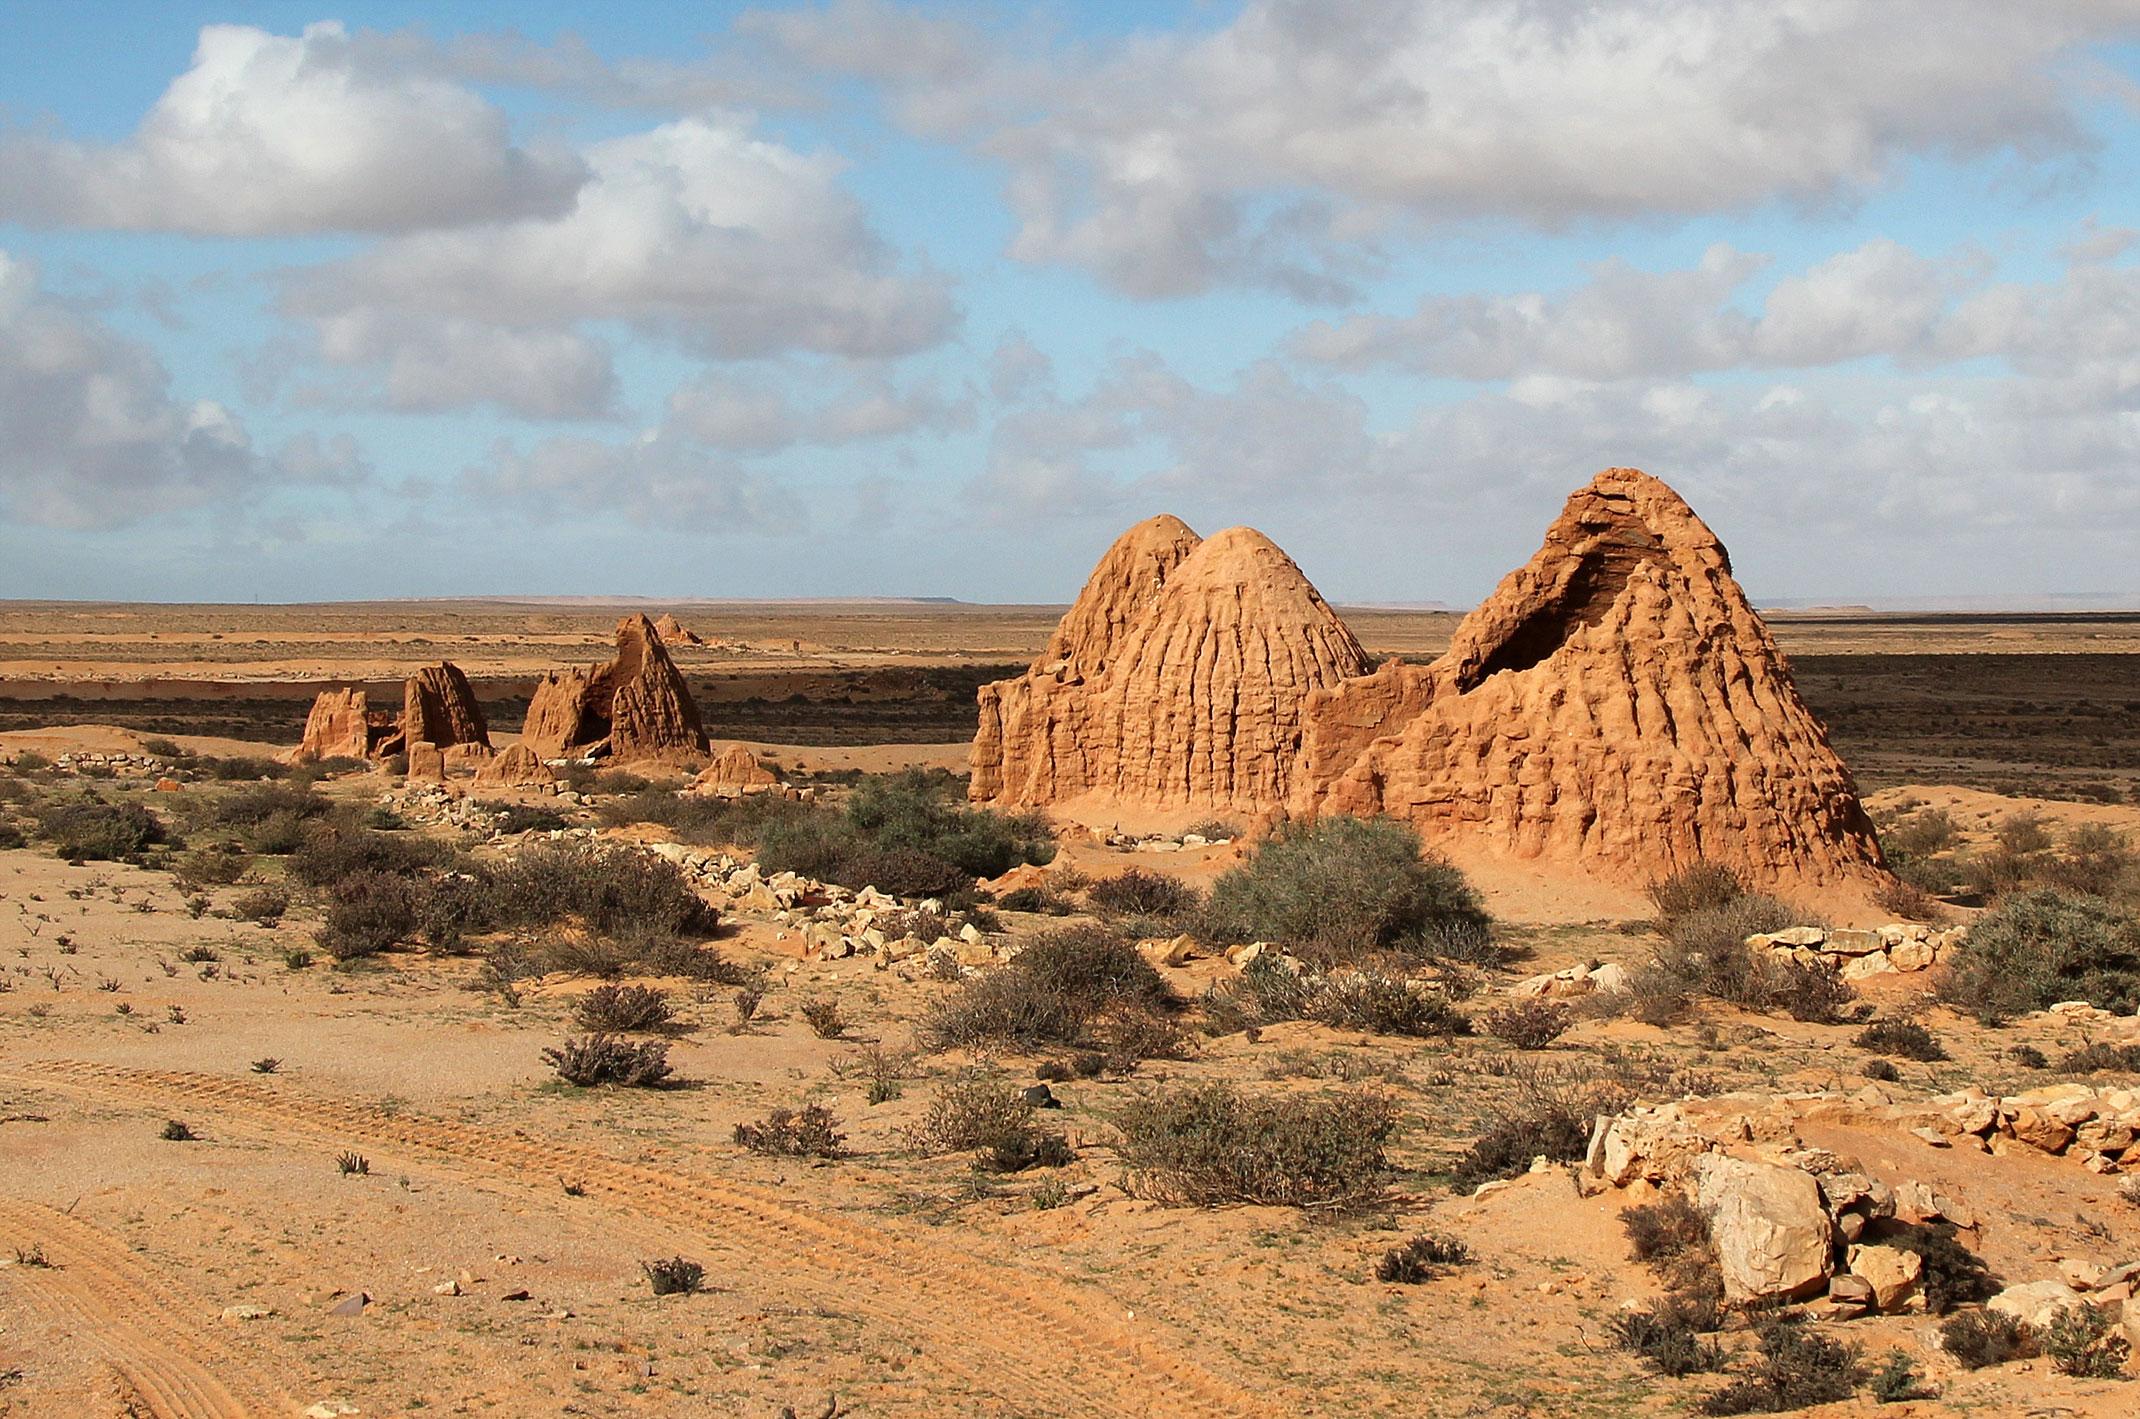 Maroko.Wioska z filmu Star Wars